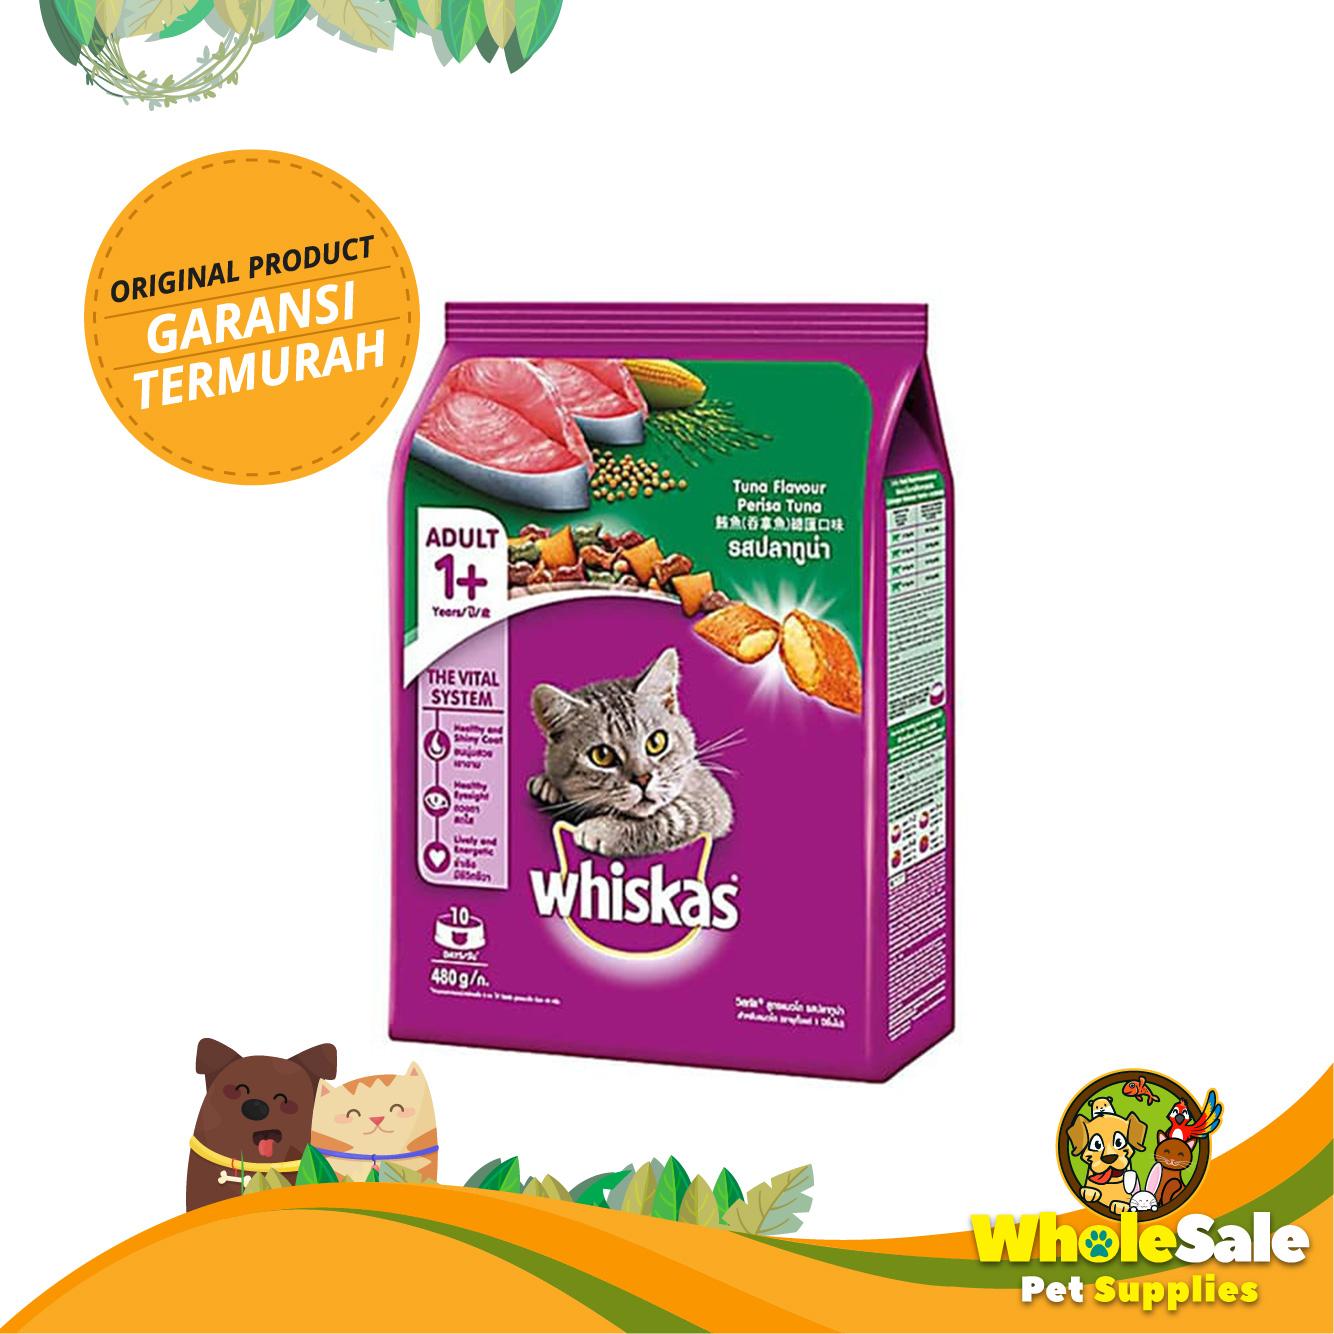 Jual MAKANAN KUCING WHISKAS TUNA 480GR - BEST SELLER - Wholesale Pet Supplies | Tokopedia